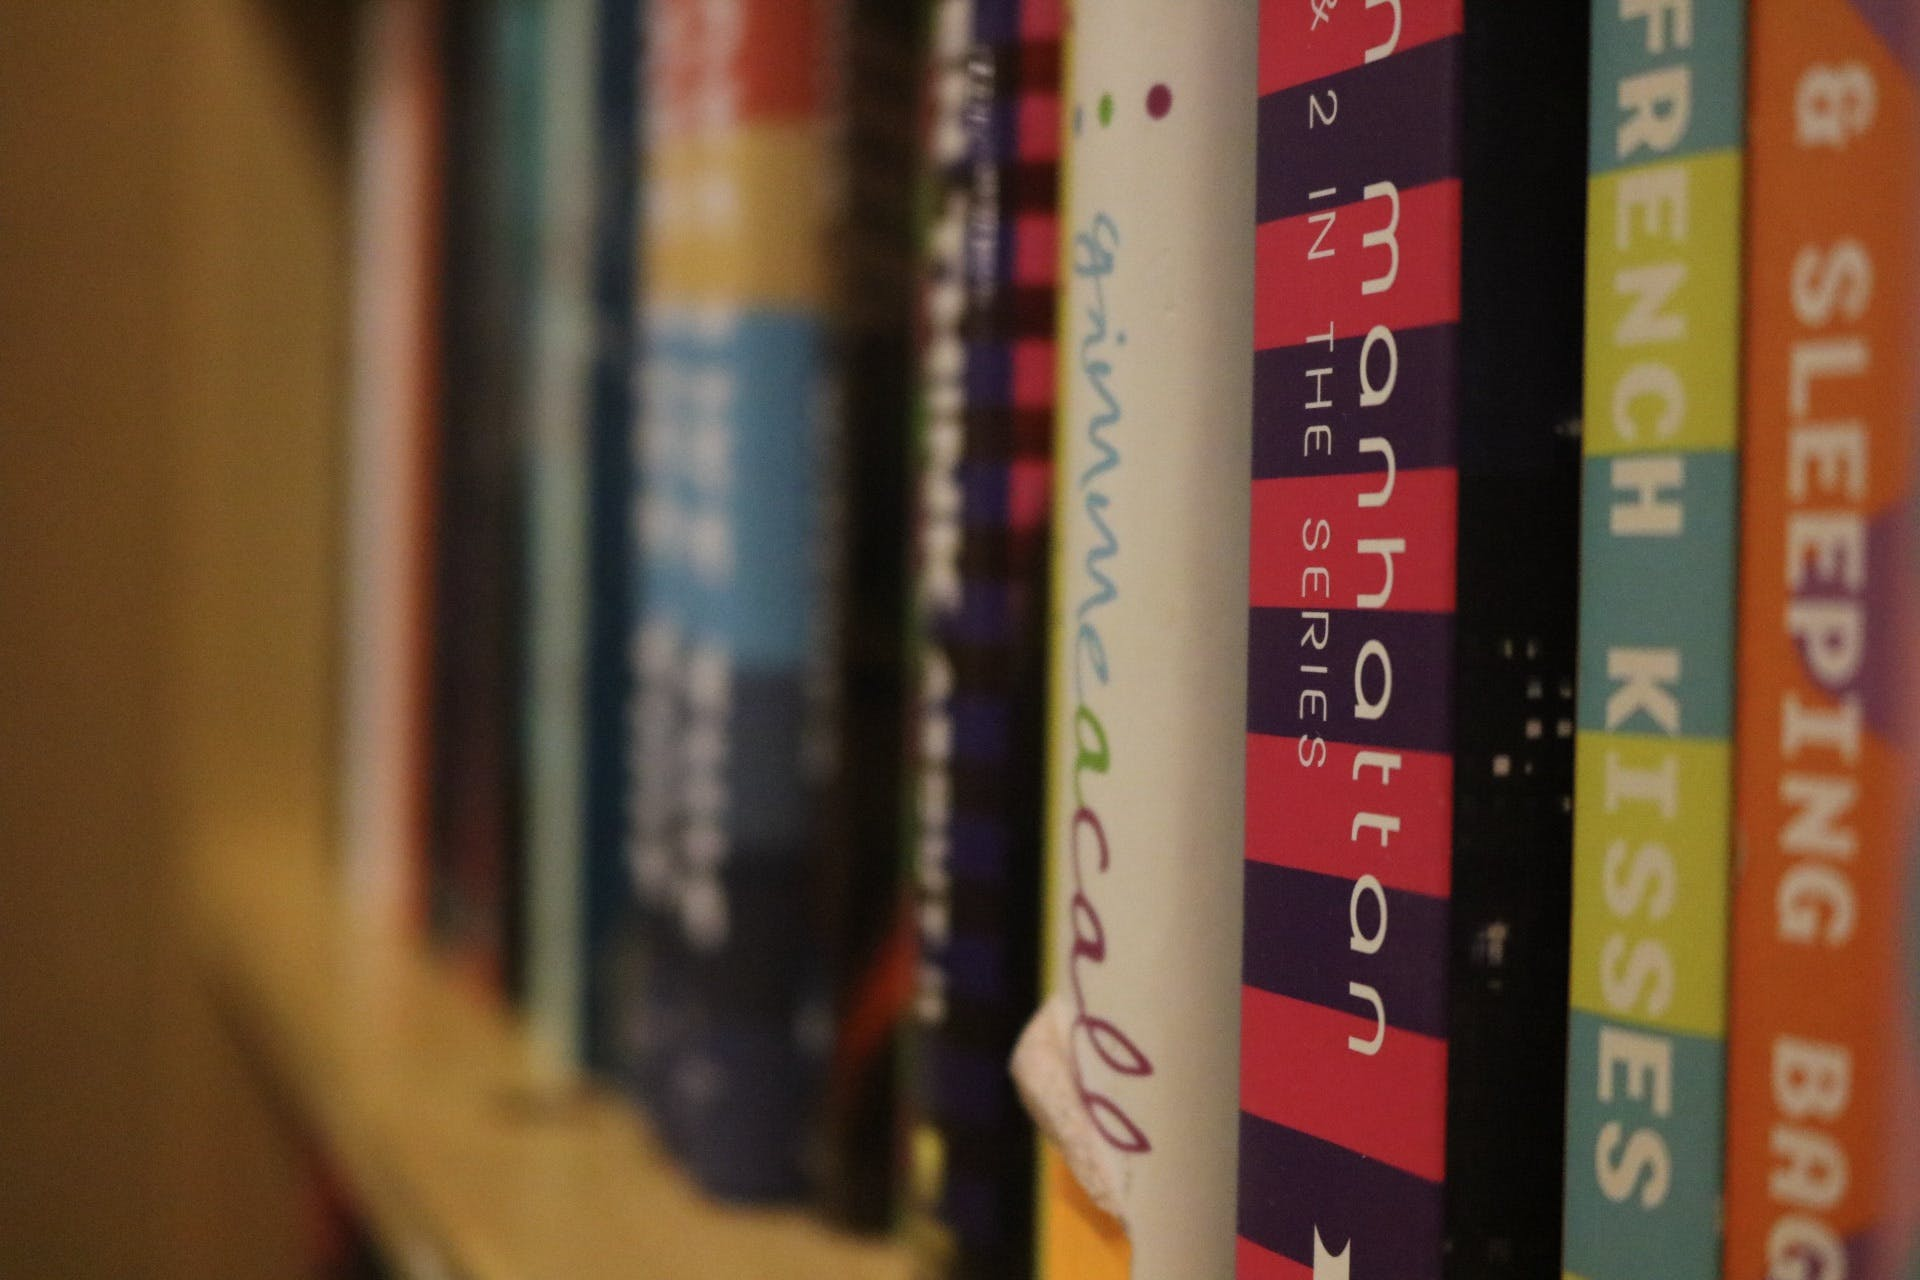 Free stock photo of book, books, bookshelf, bookstore